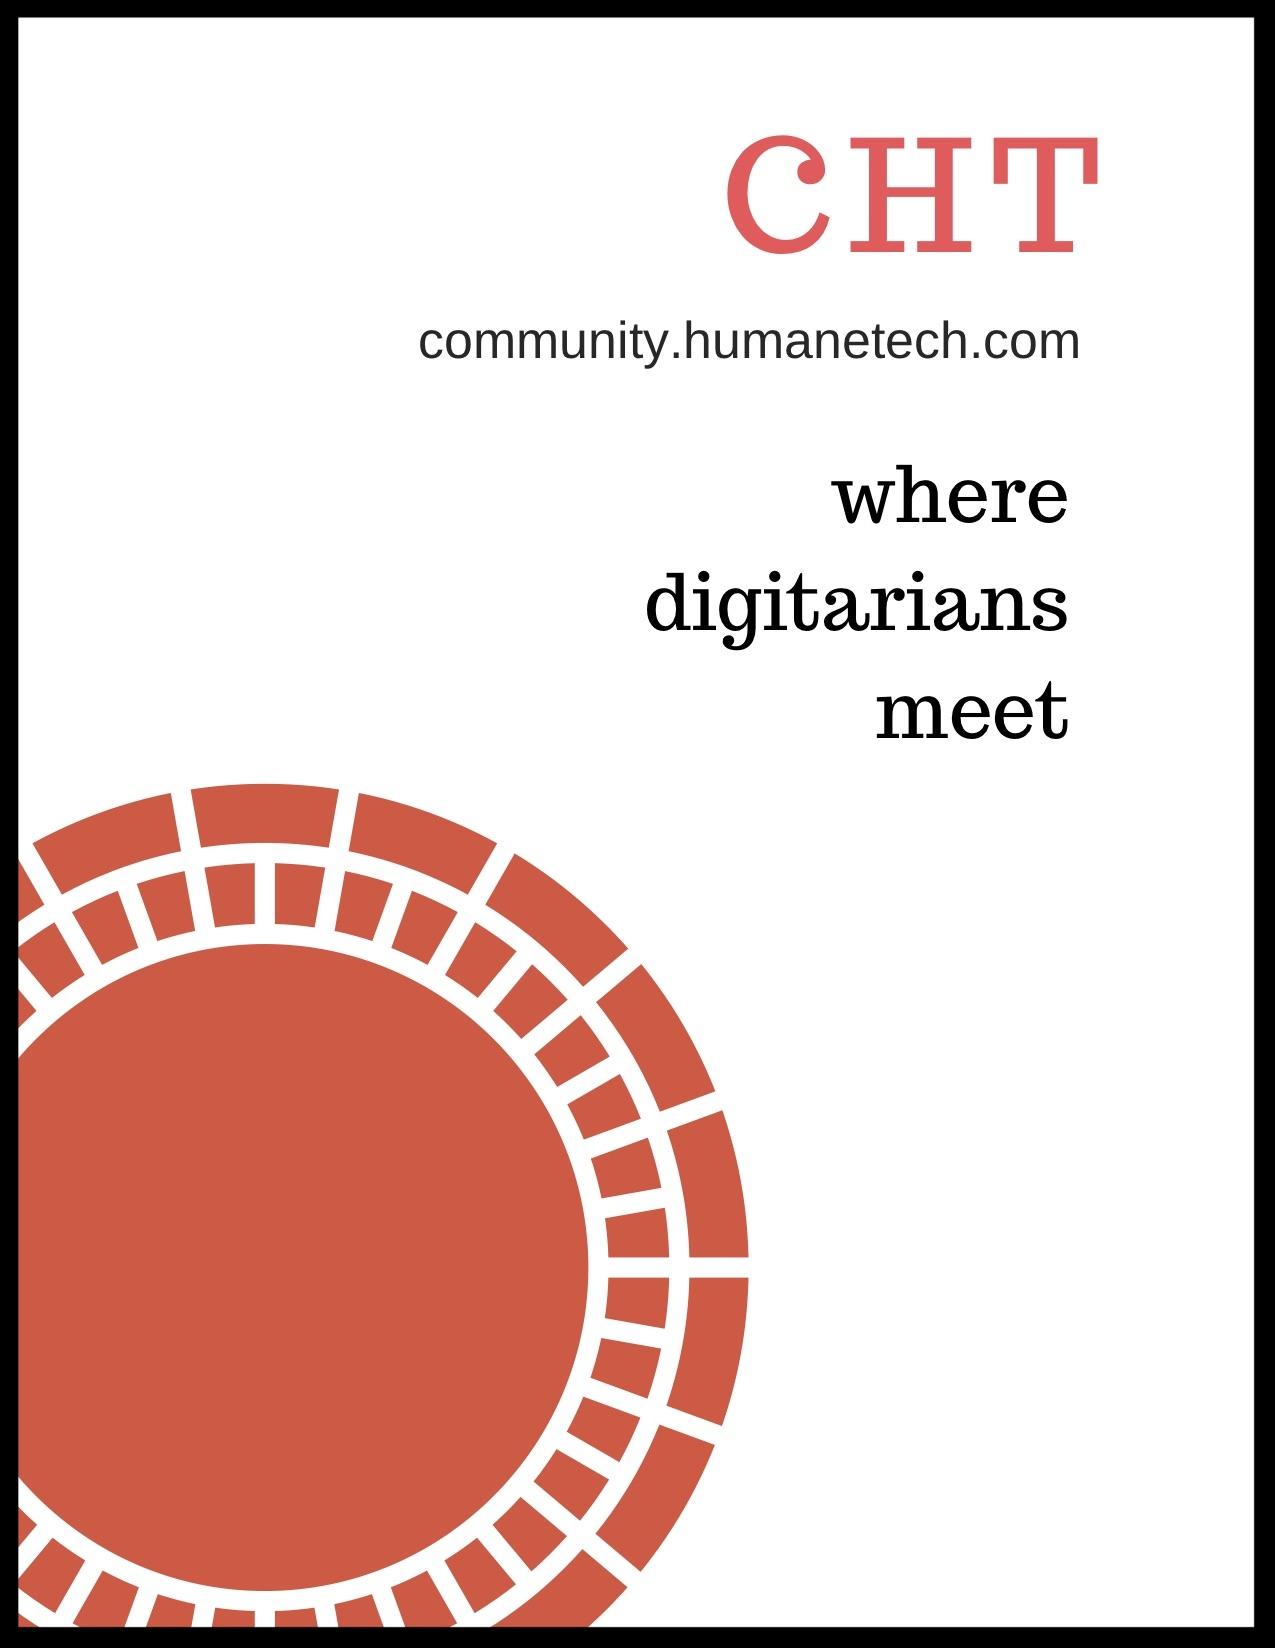 CHT flyer.jpg